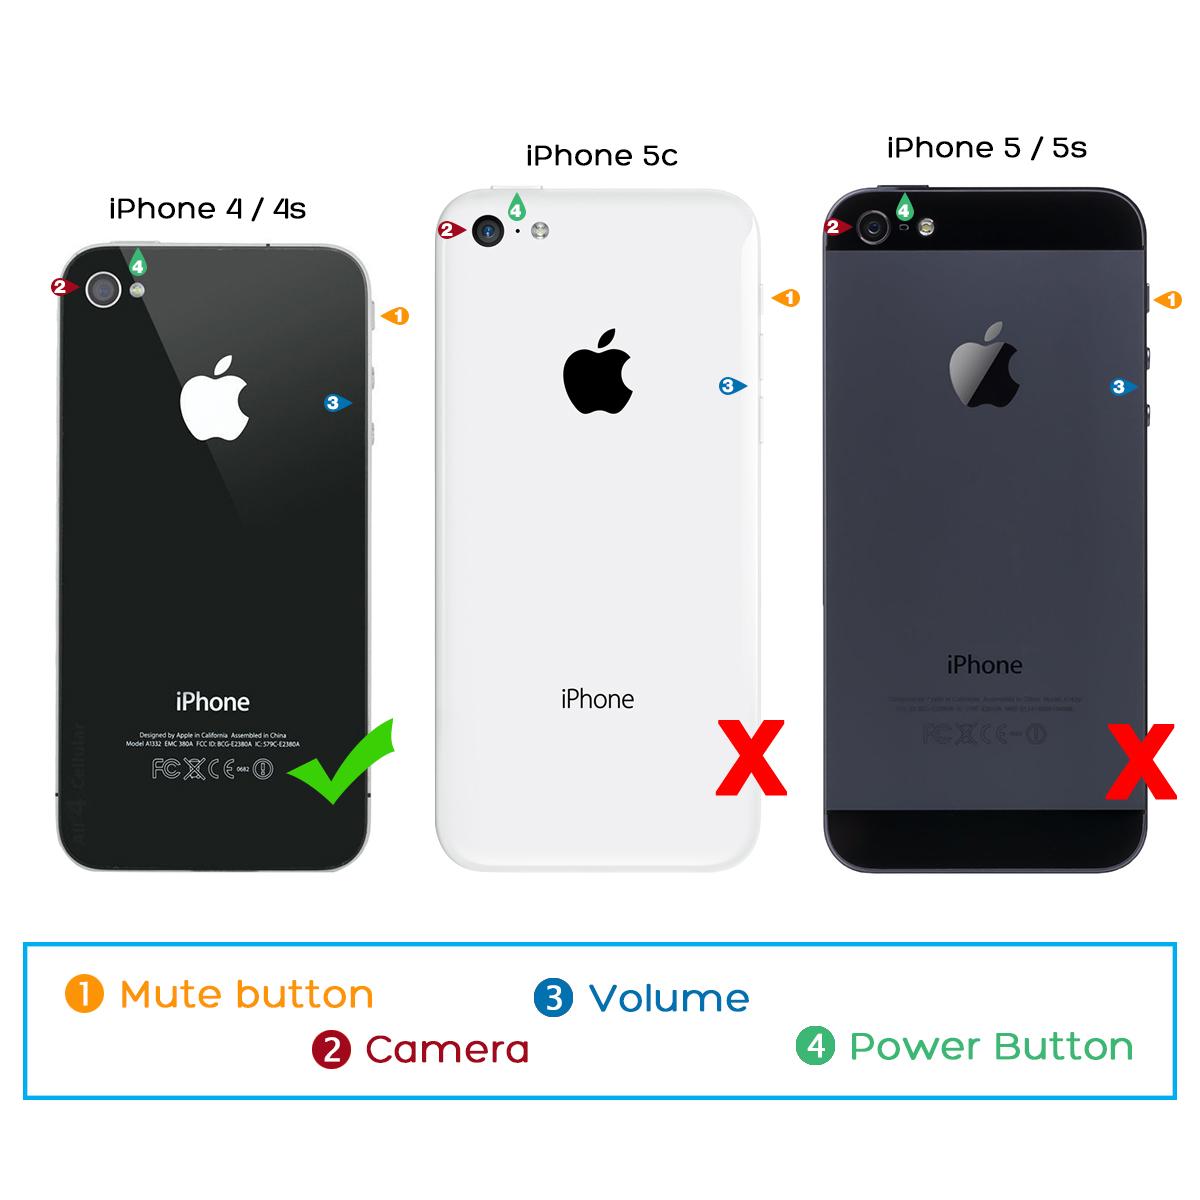 back of iphone 4s diagram ford explorer fuse panel ulak aluminum chrome coating bumper hard case cover